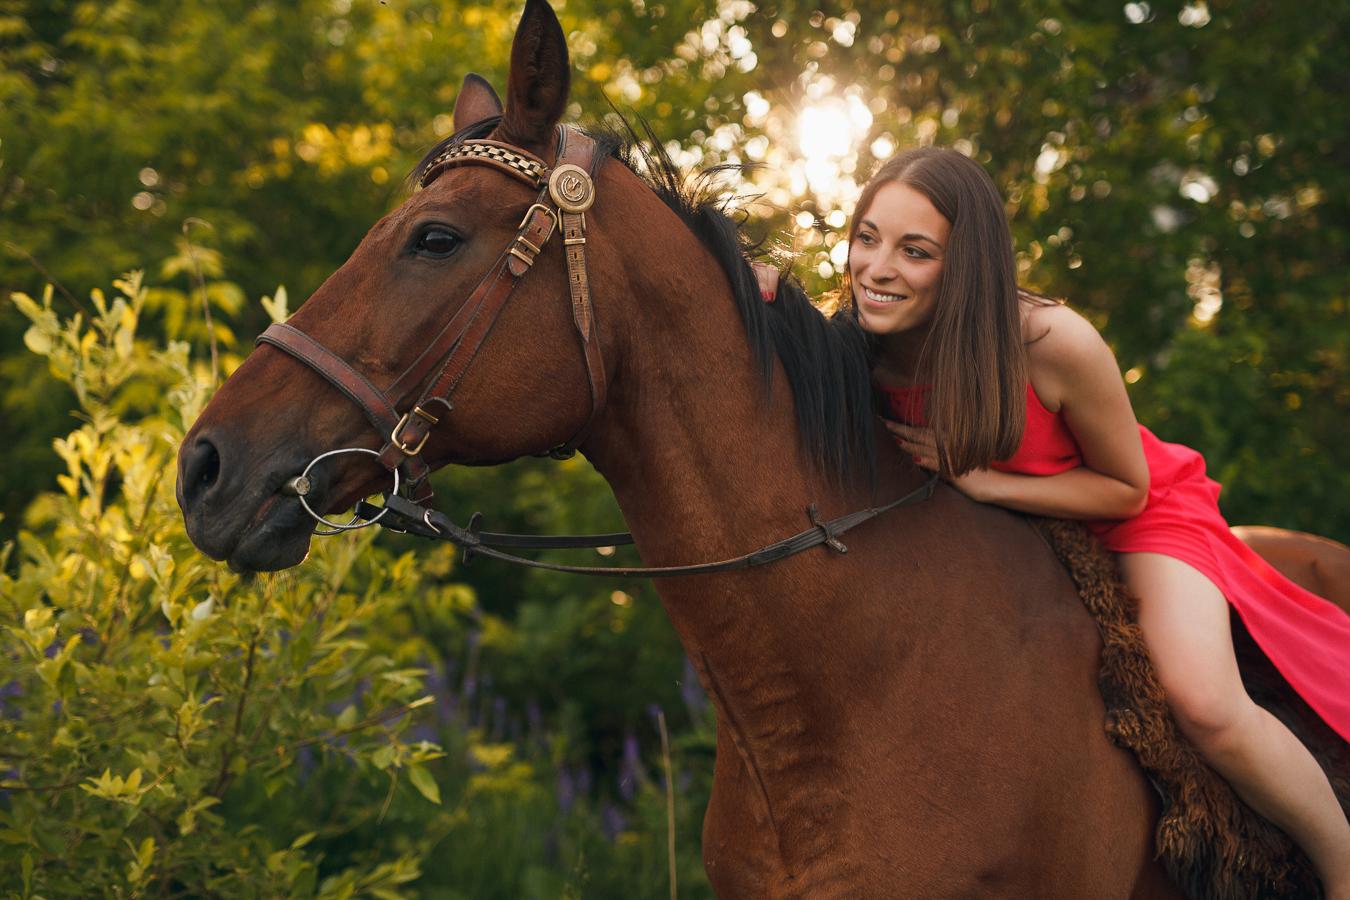 Съёмка с лошадьми. Впечатления модели.